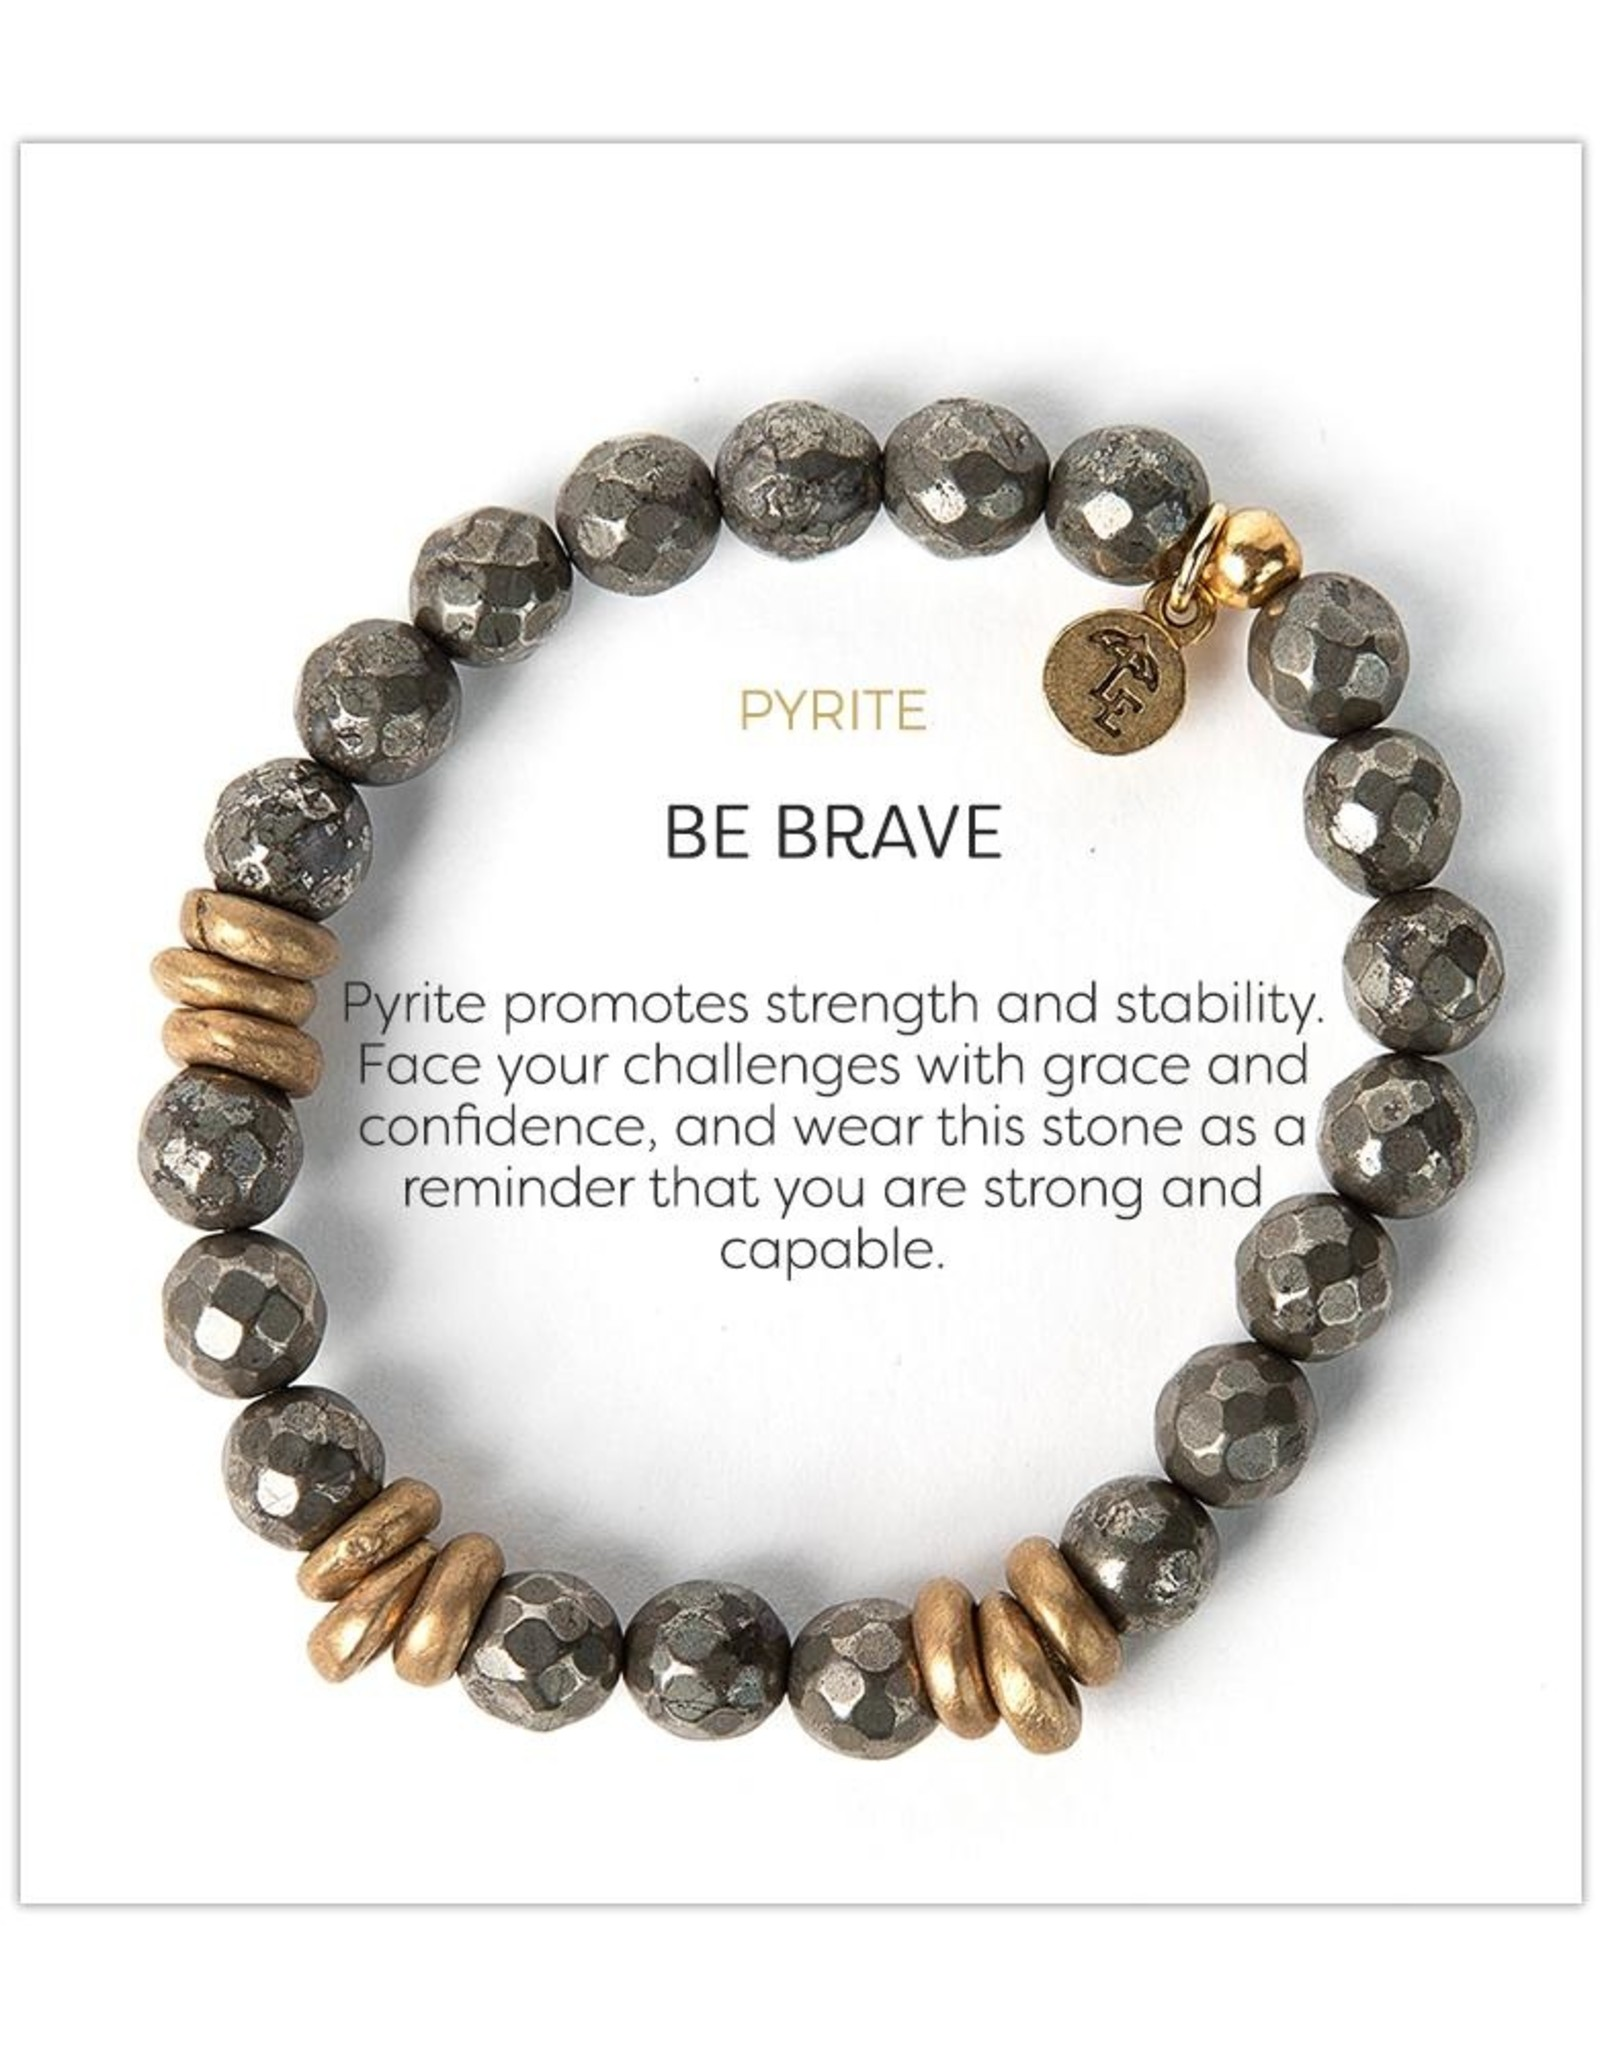 L&E Gemstone Bracelet, pyrite, 8mm